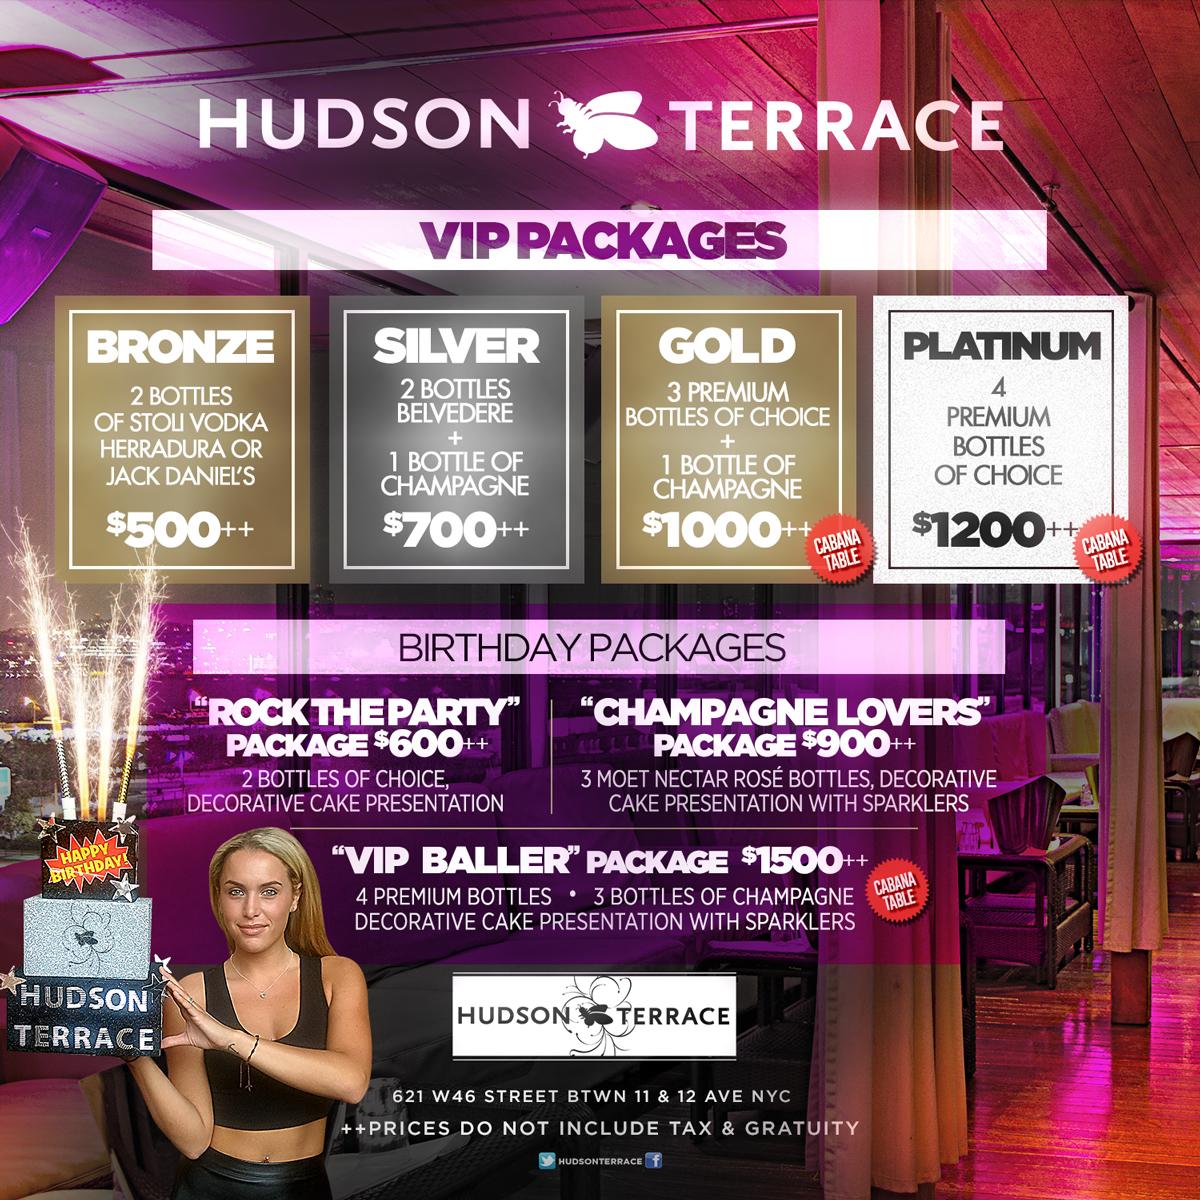 guest list, bottle service, new york promoter, nyc promoter, manhattan promoter, hudson terrace promoter